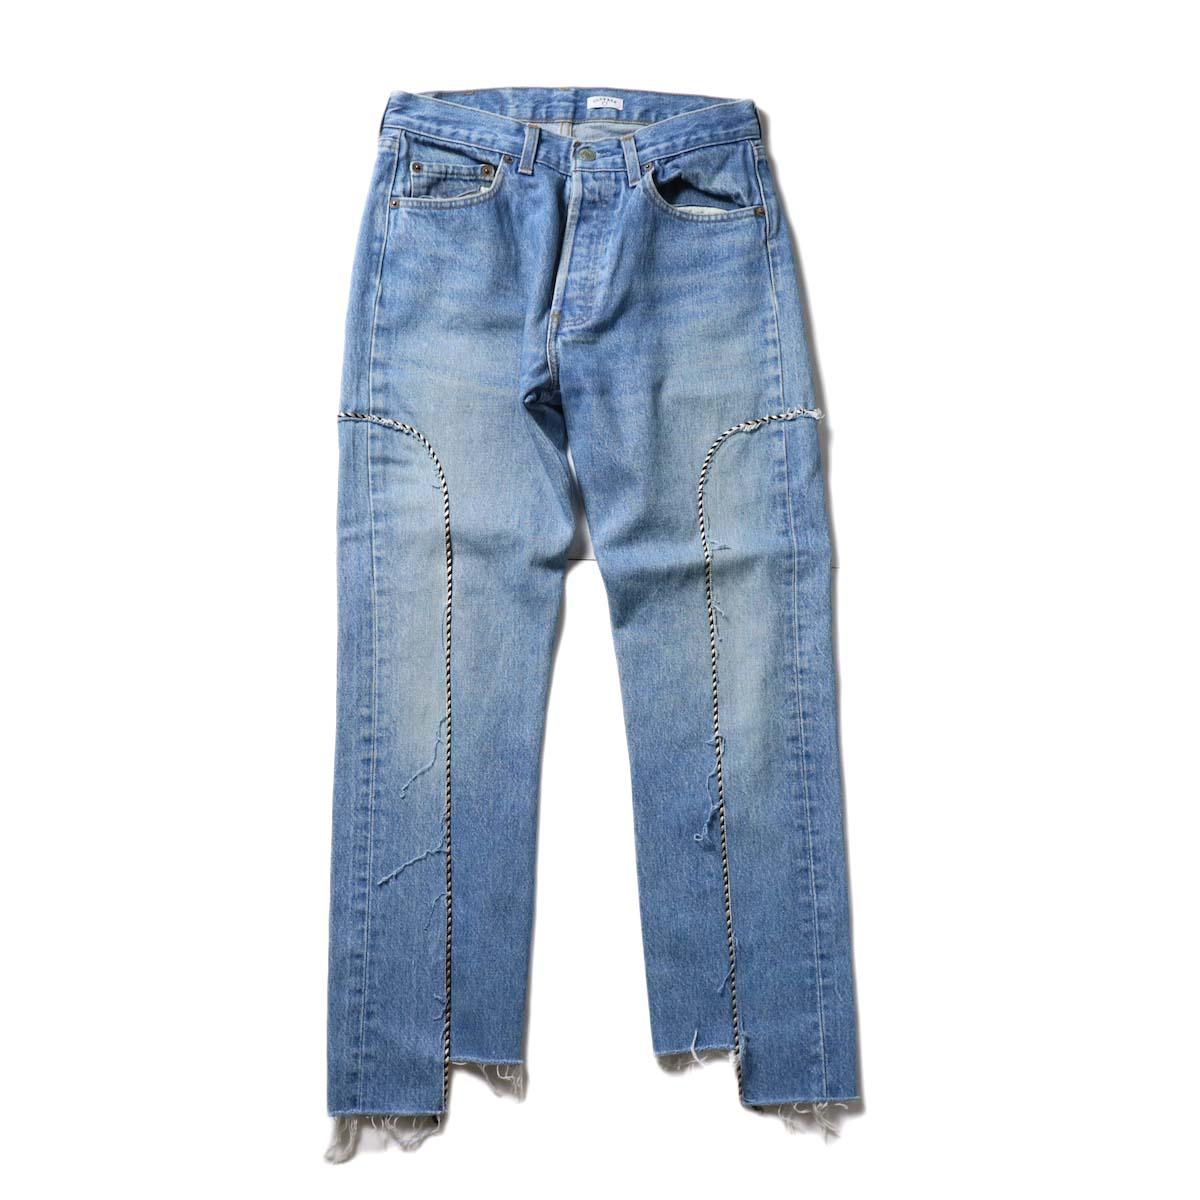 OLD PARK / Western Jeans Blue (Ssize-D)